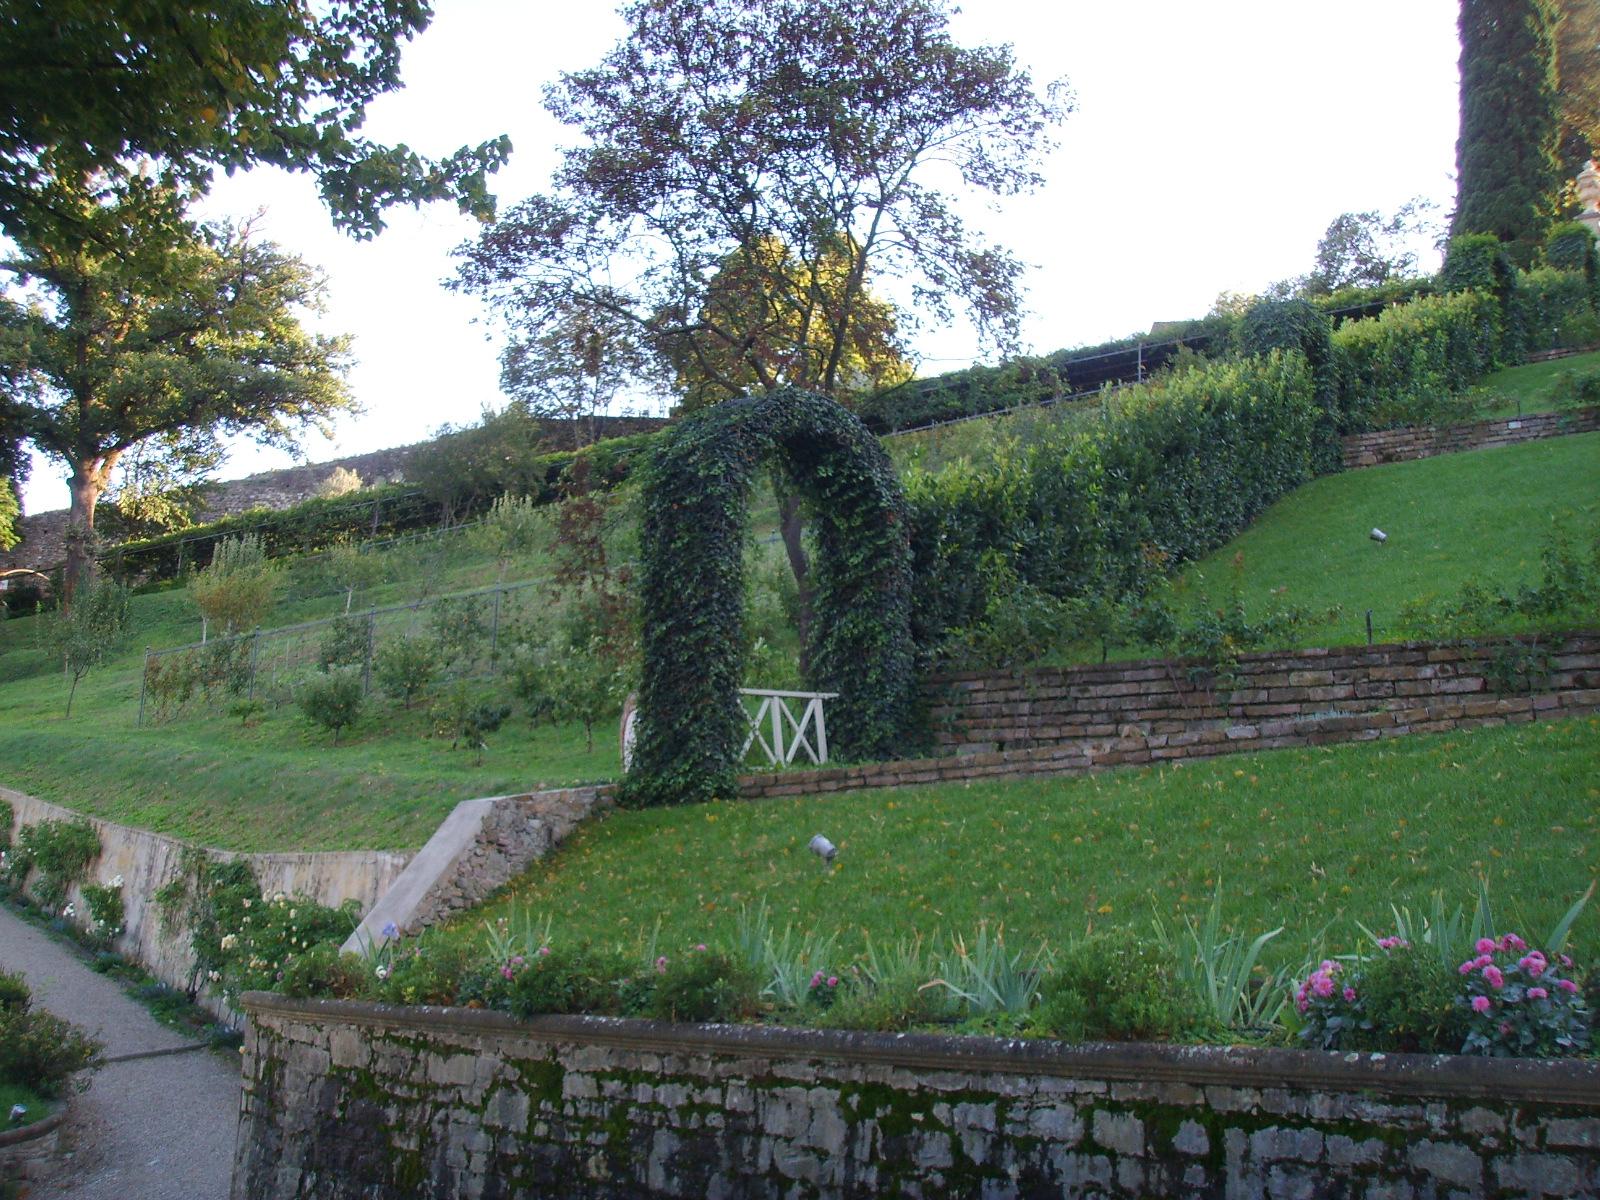 File:Giardino bardini, terrazzamento 07.JPG - Wikipedia